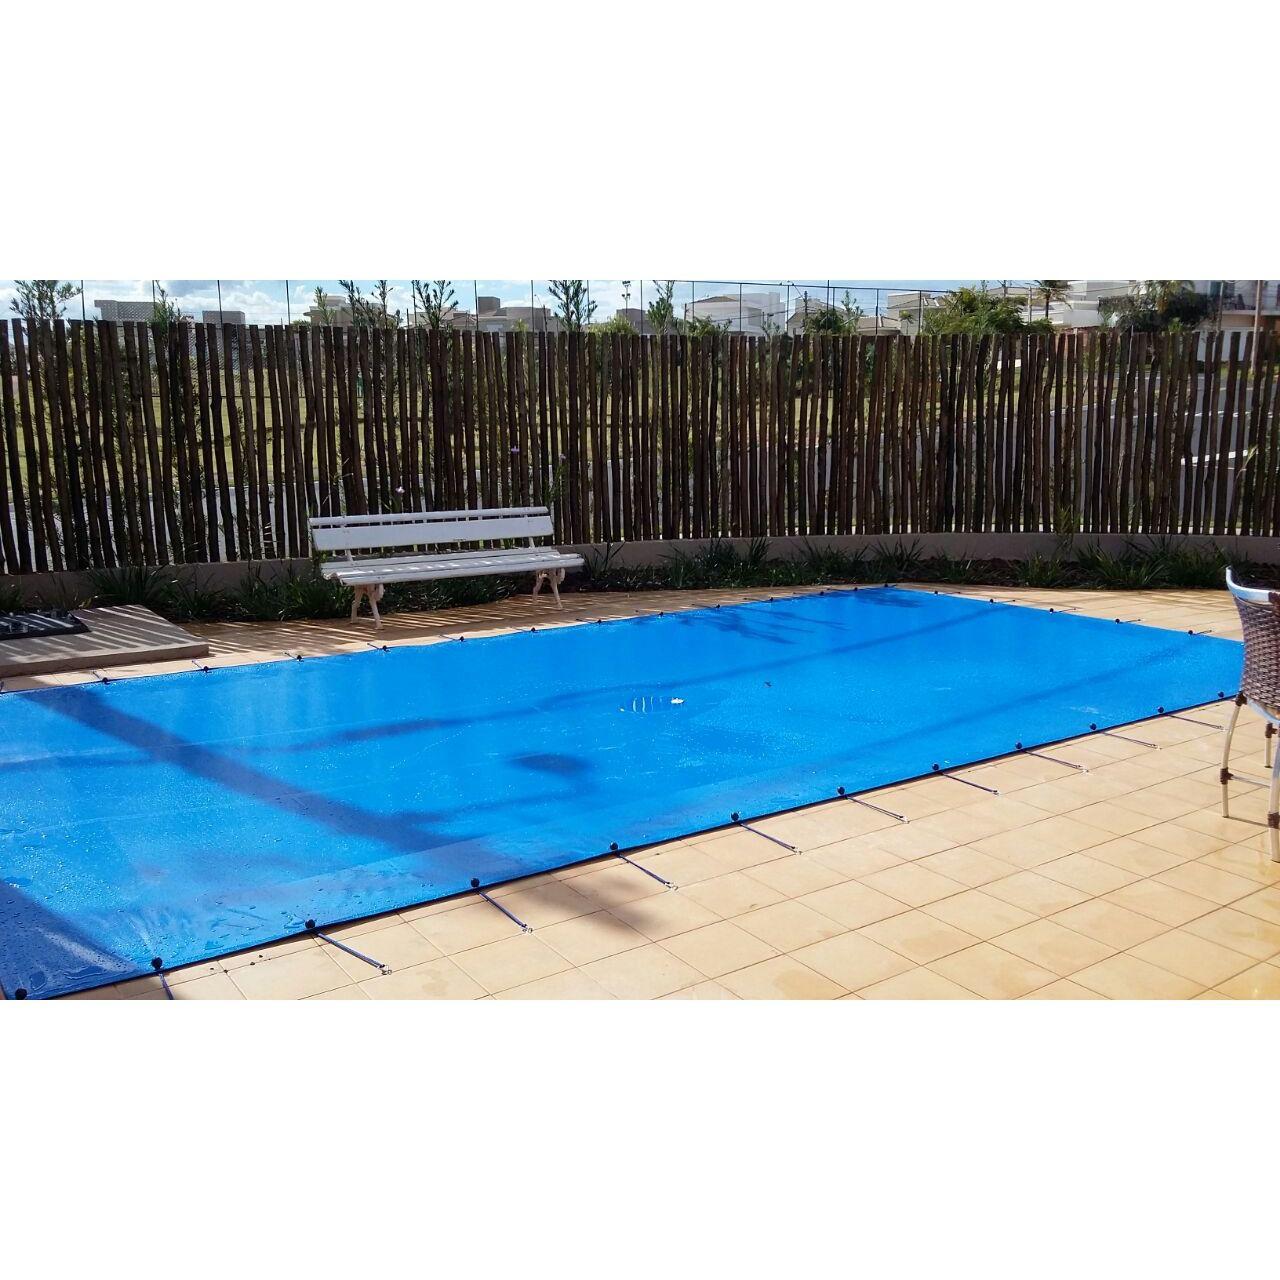 Lona Polietileno Azul 300 Micras - 5x4,5